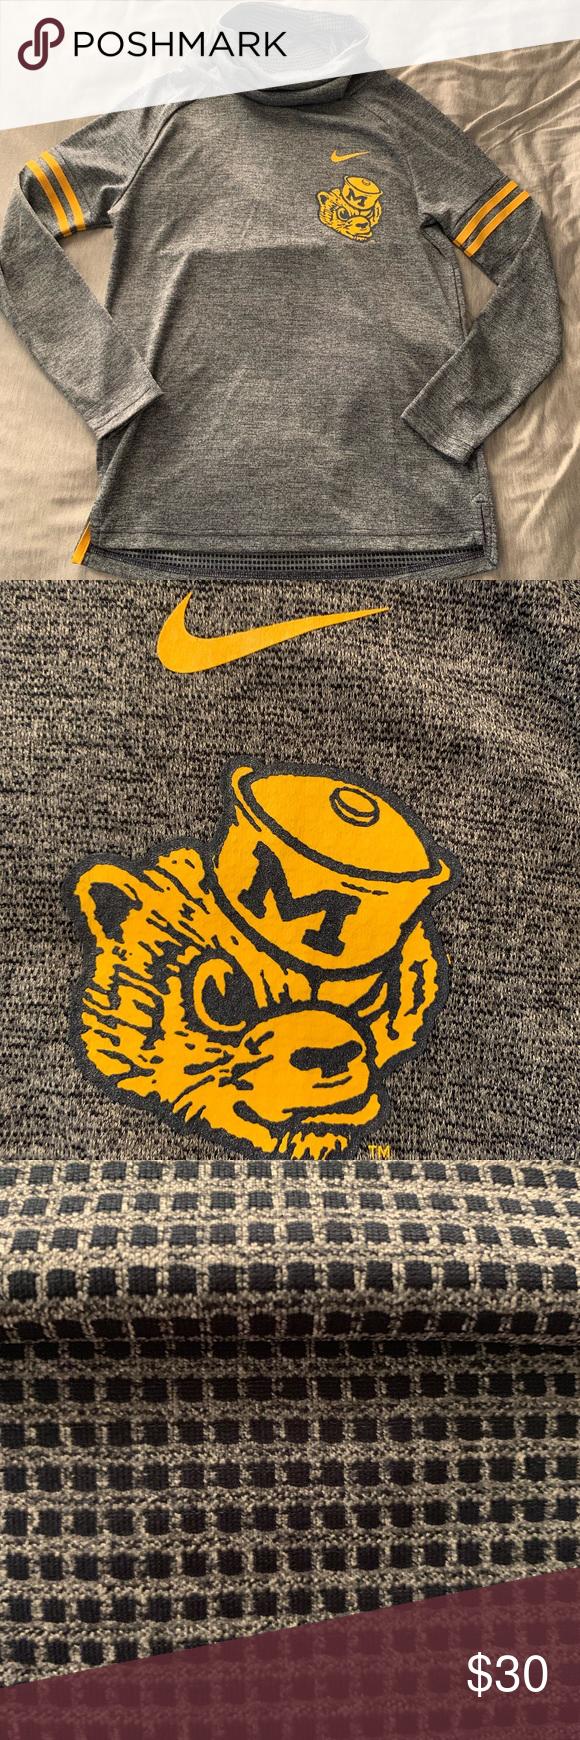 Nwot Nike Michigan Wolverines Sweatshirt Sweatshirts Cute Turtles Nike Sweatshirts [ 1740 x 580 Pixel ]